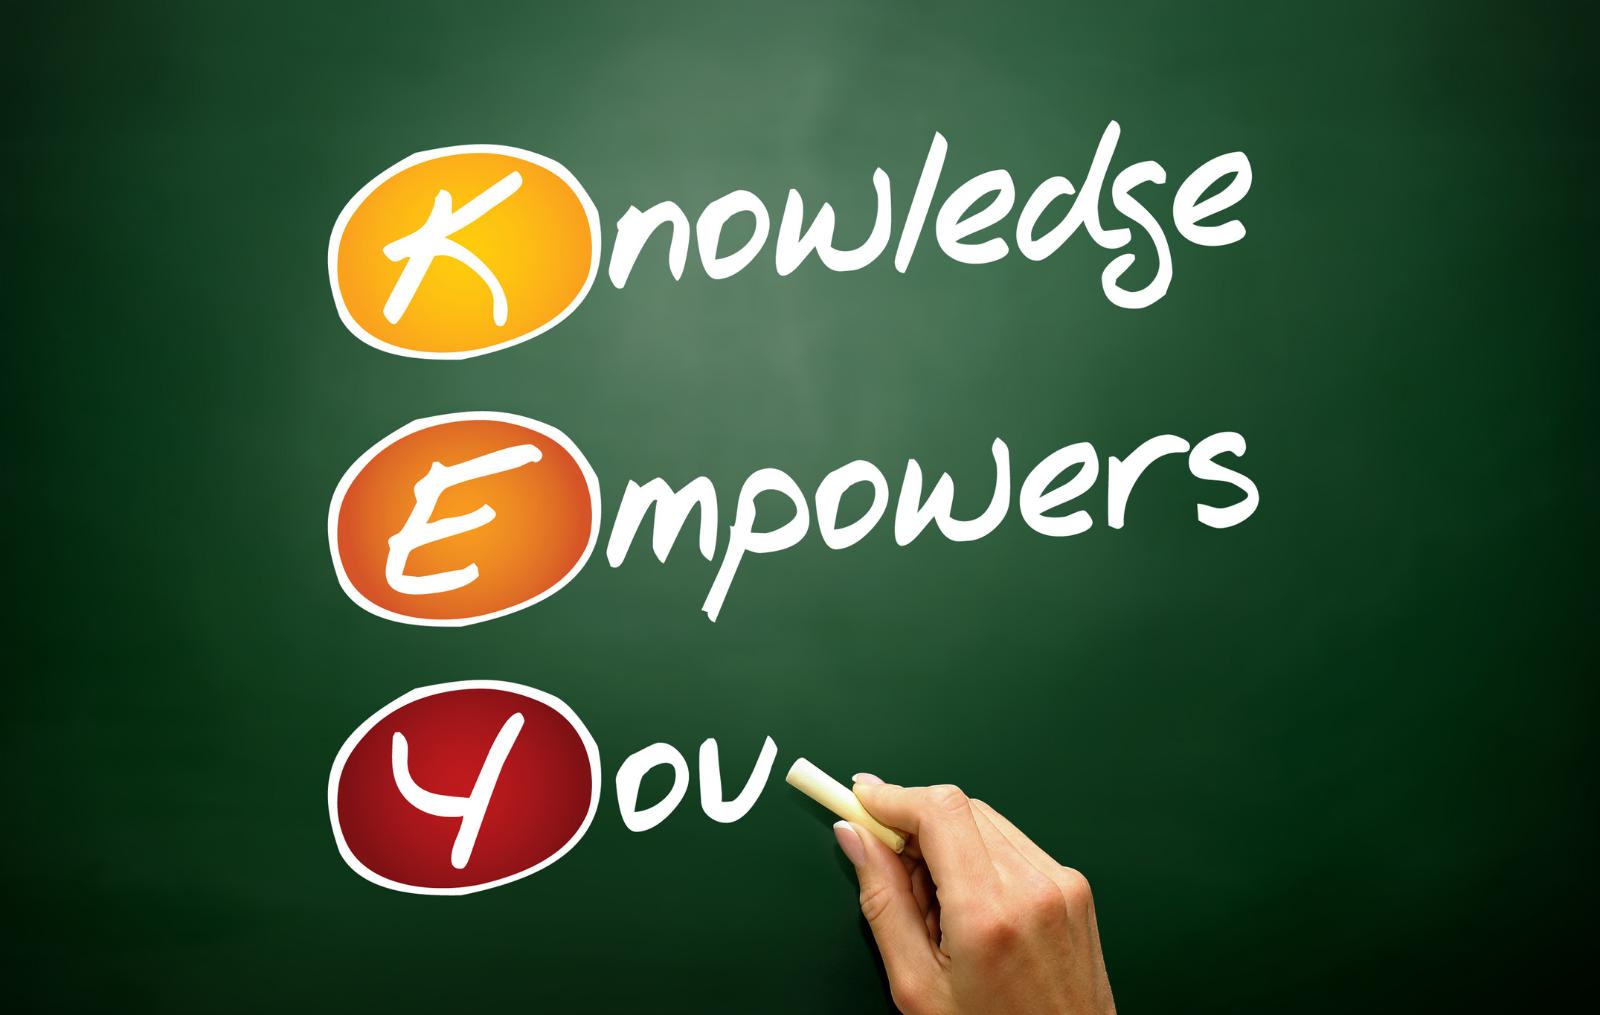 <strong>Como avaliar a aprendizagem dos alunos? Parte 2</strong>